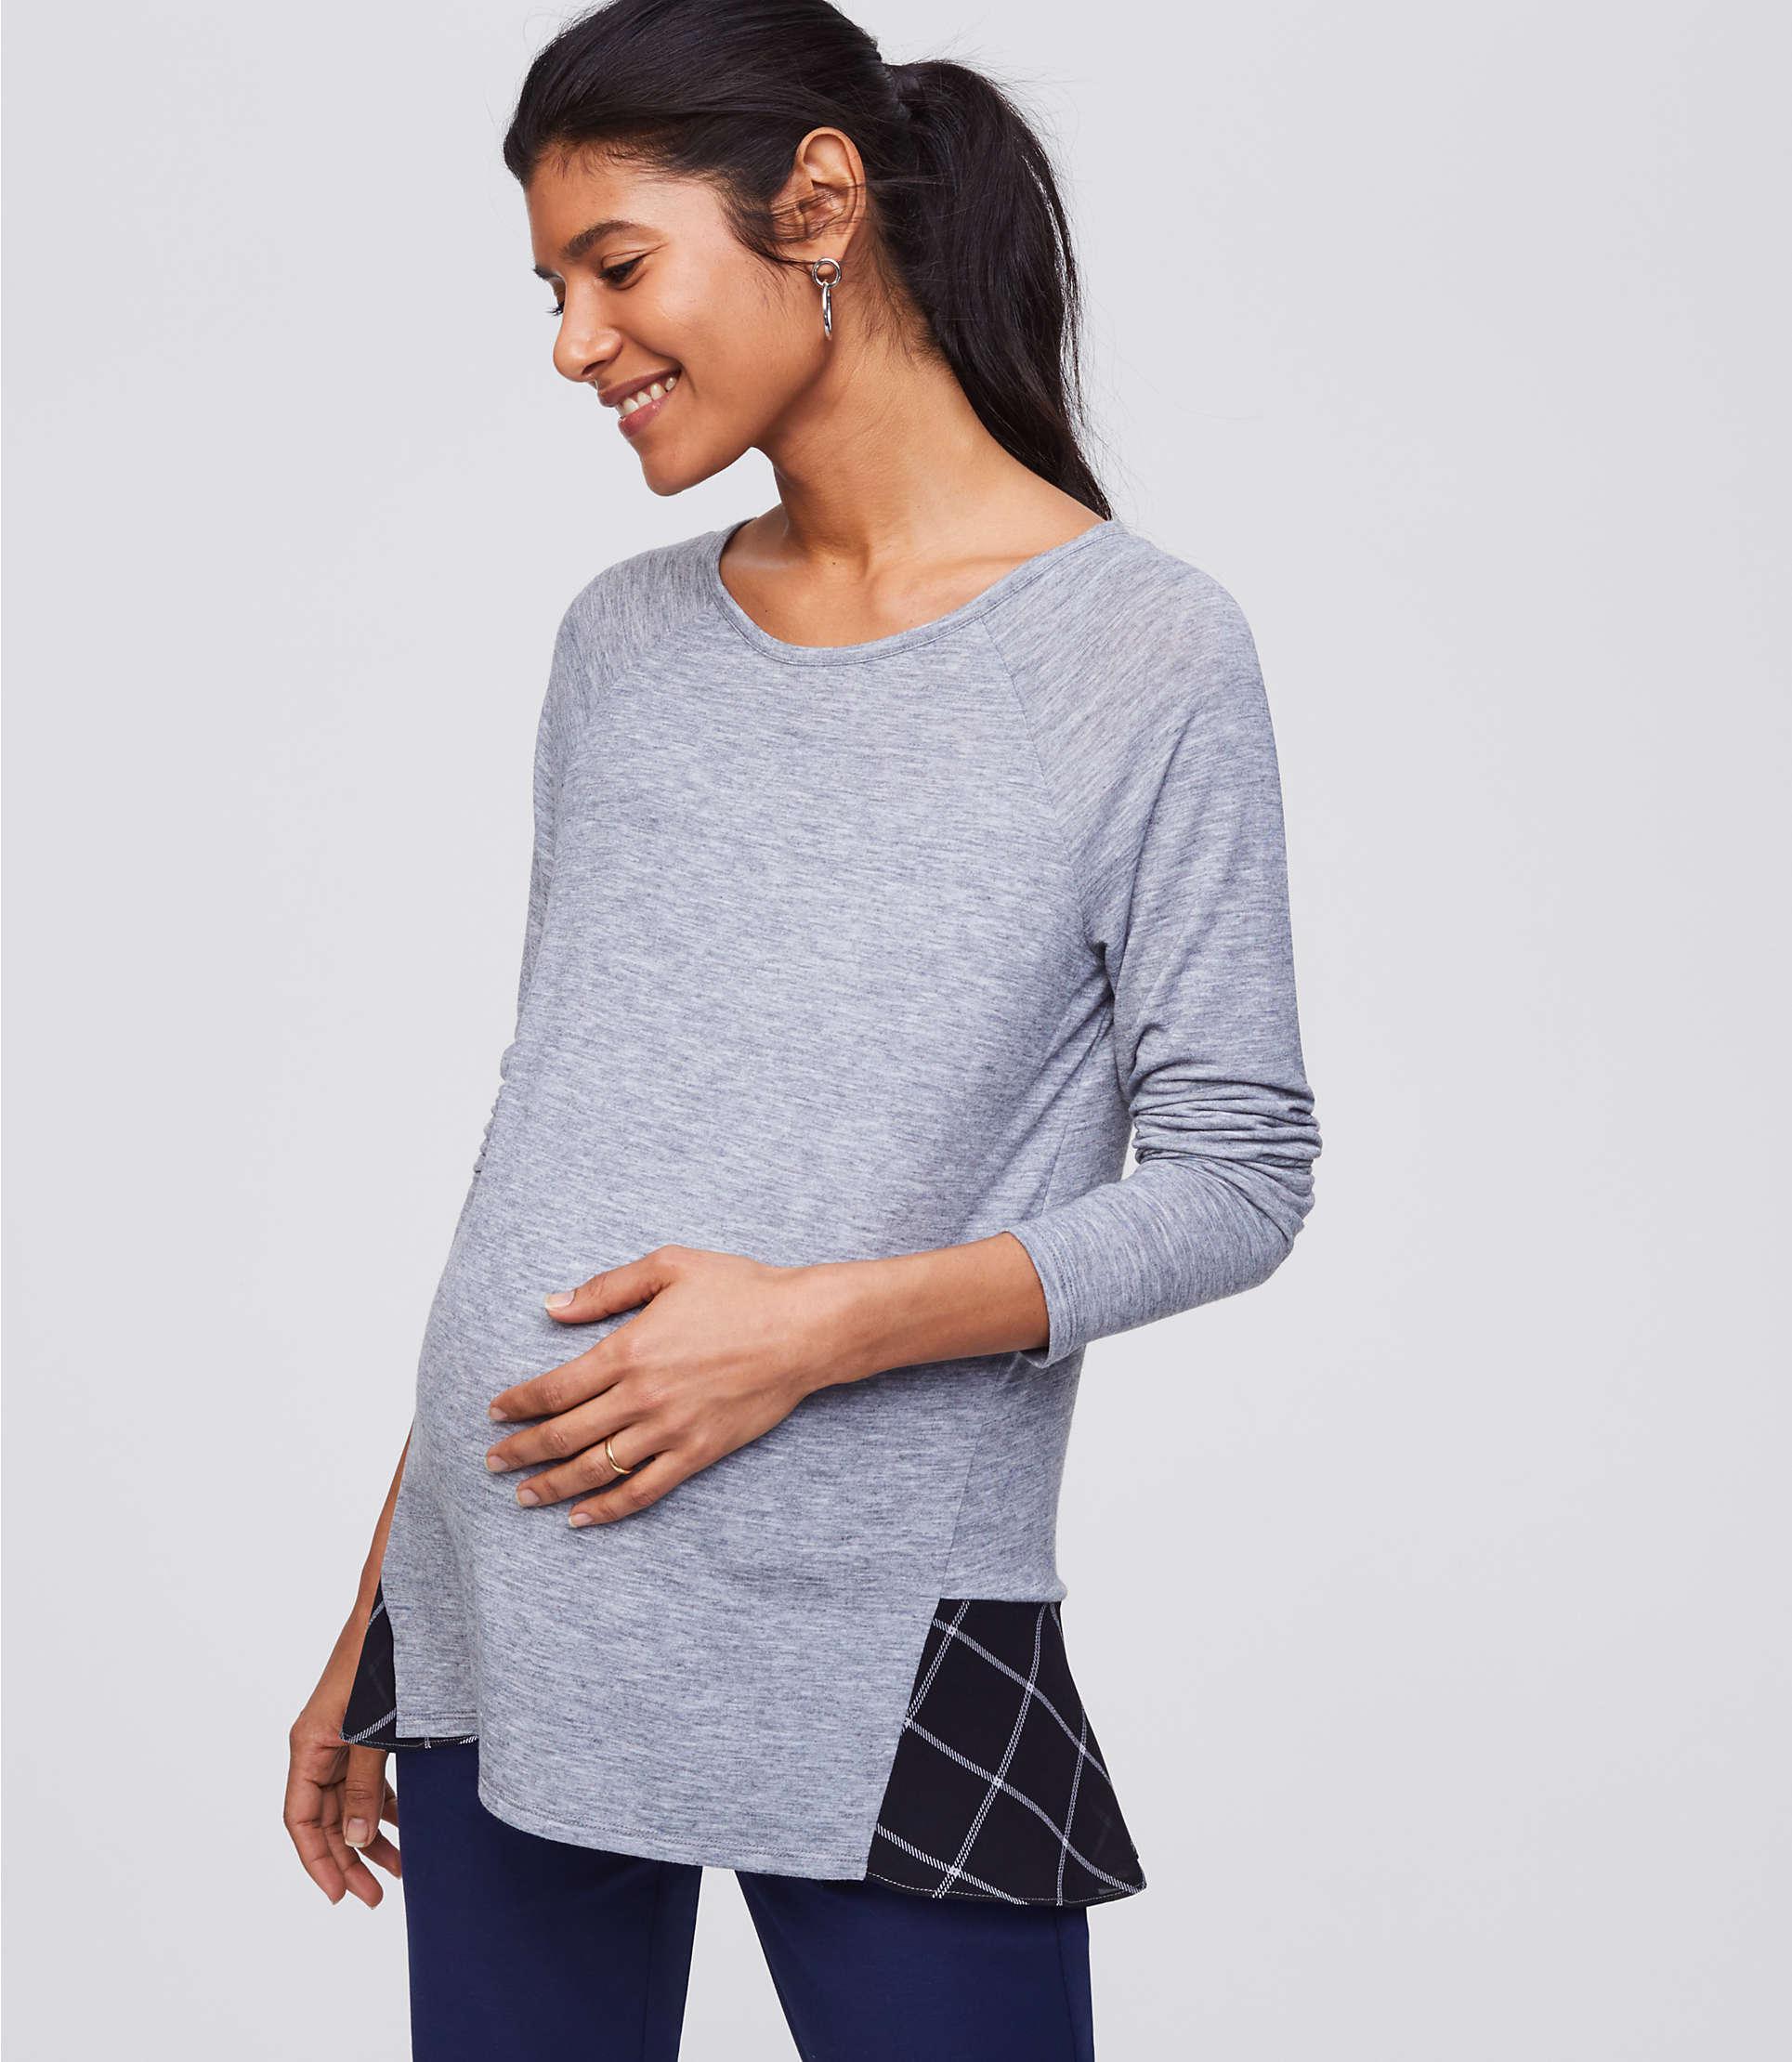 e315abebfa932 LOFT Maternity Plaid Flounce Mixed Media Top in Gray - Lyst